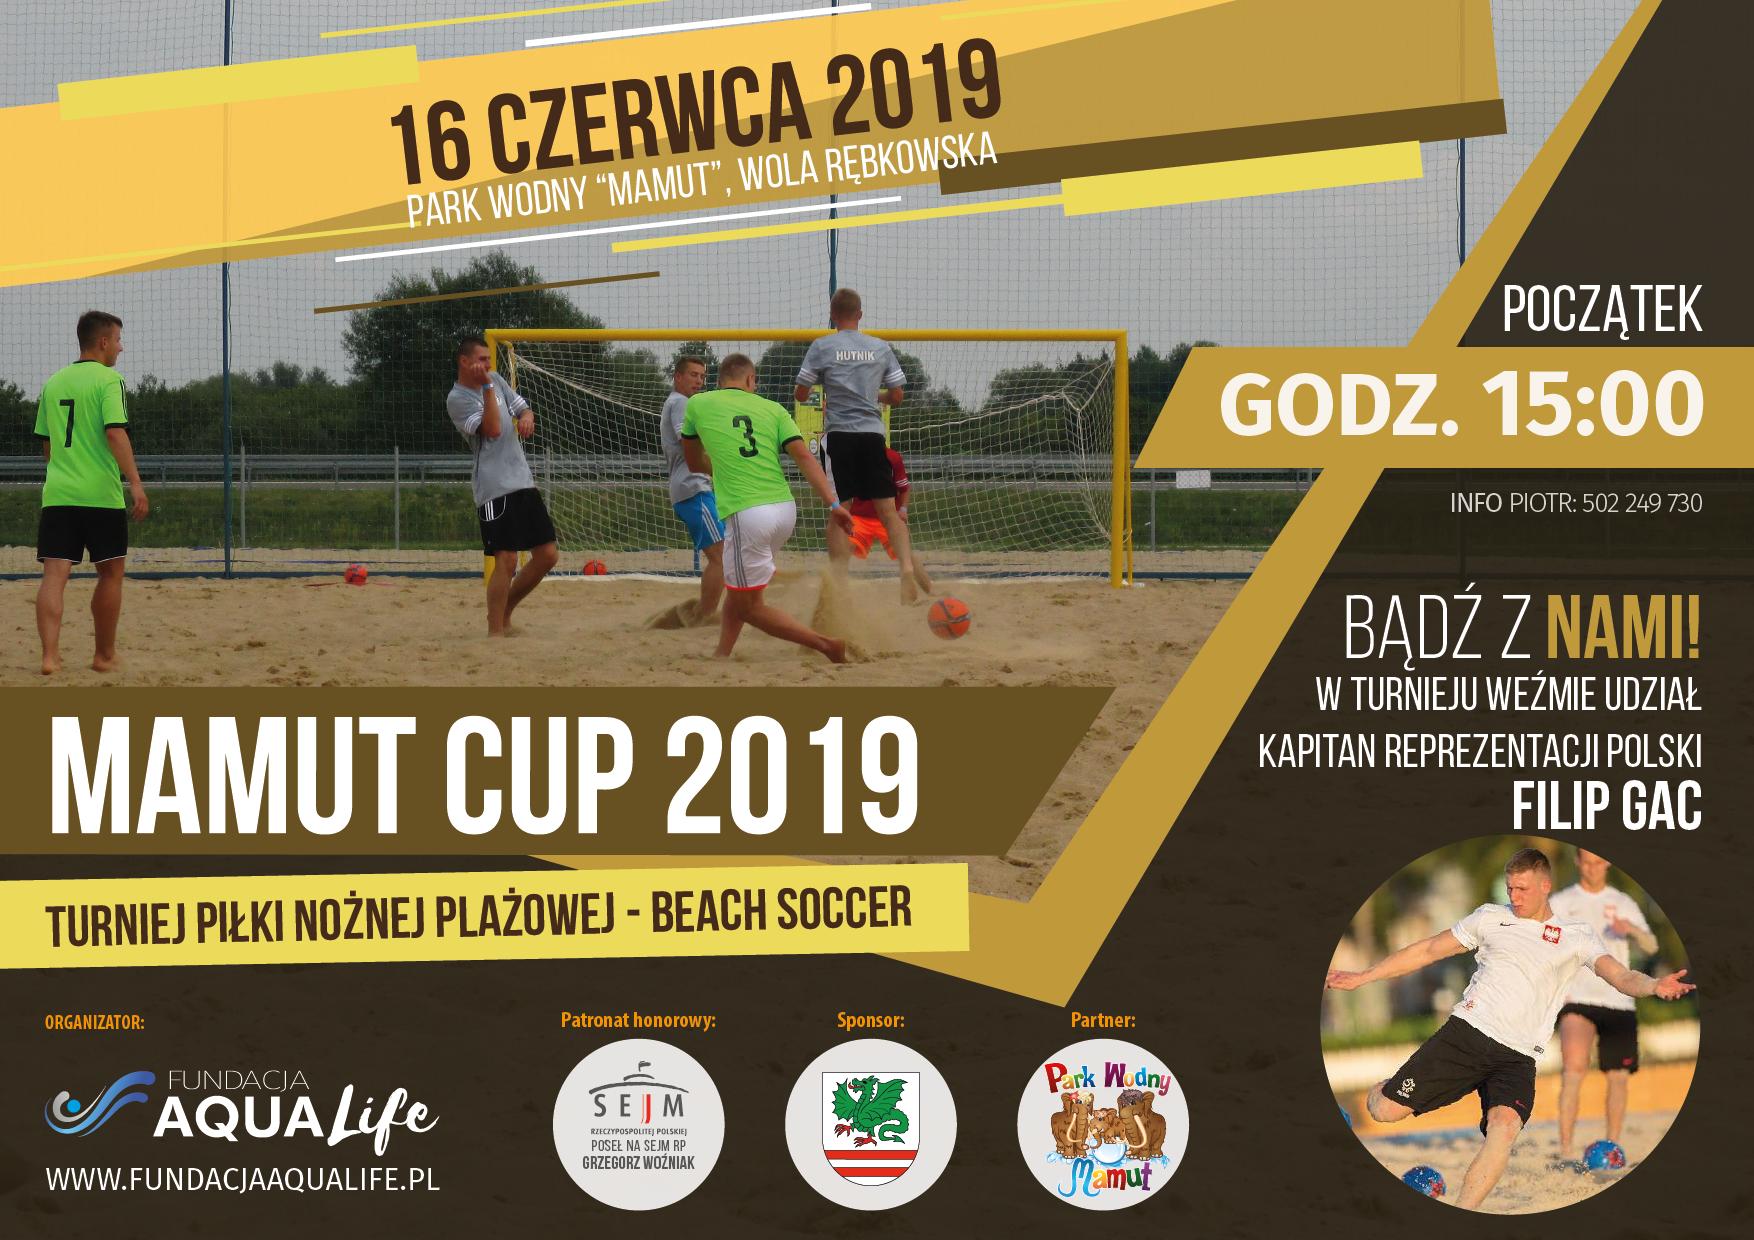 Mamut Cup 2019